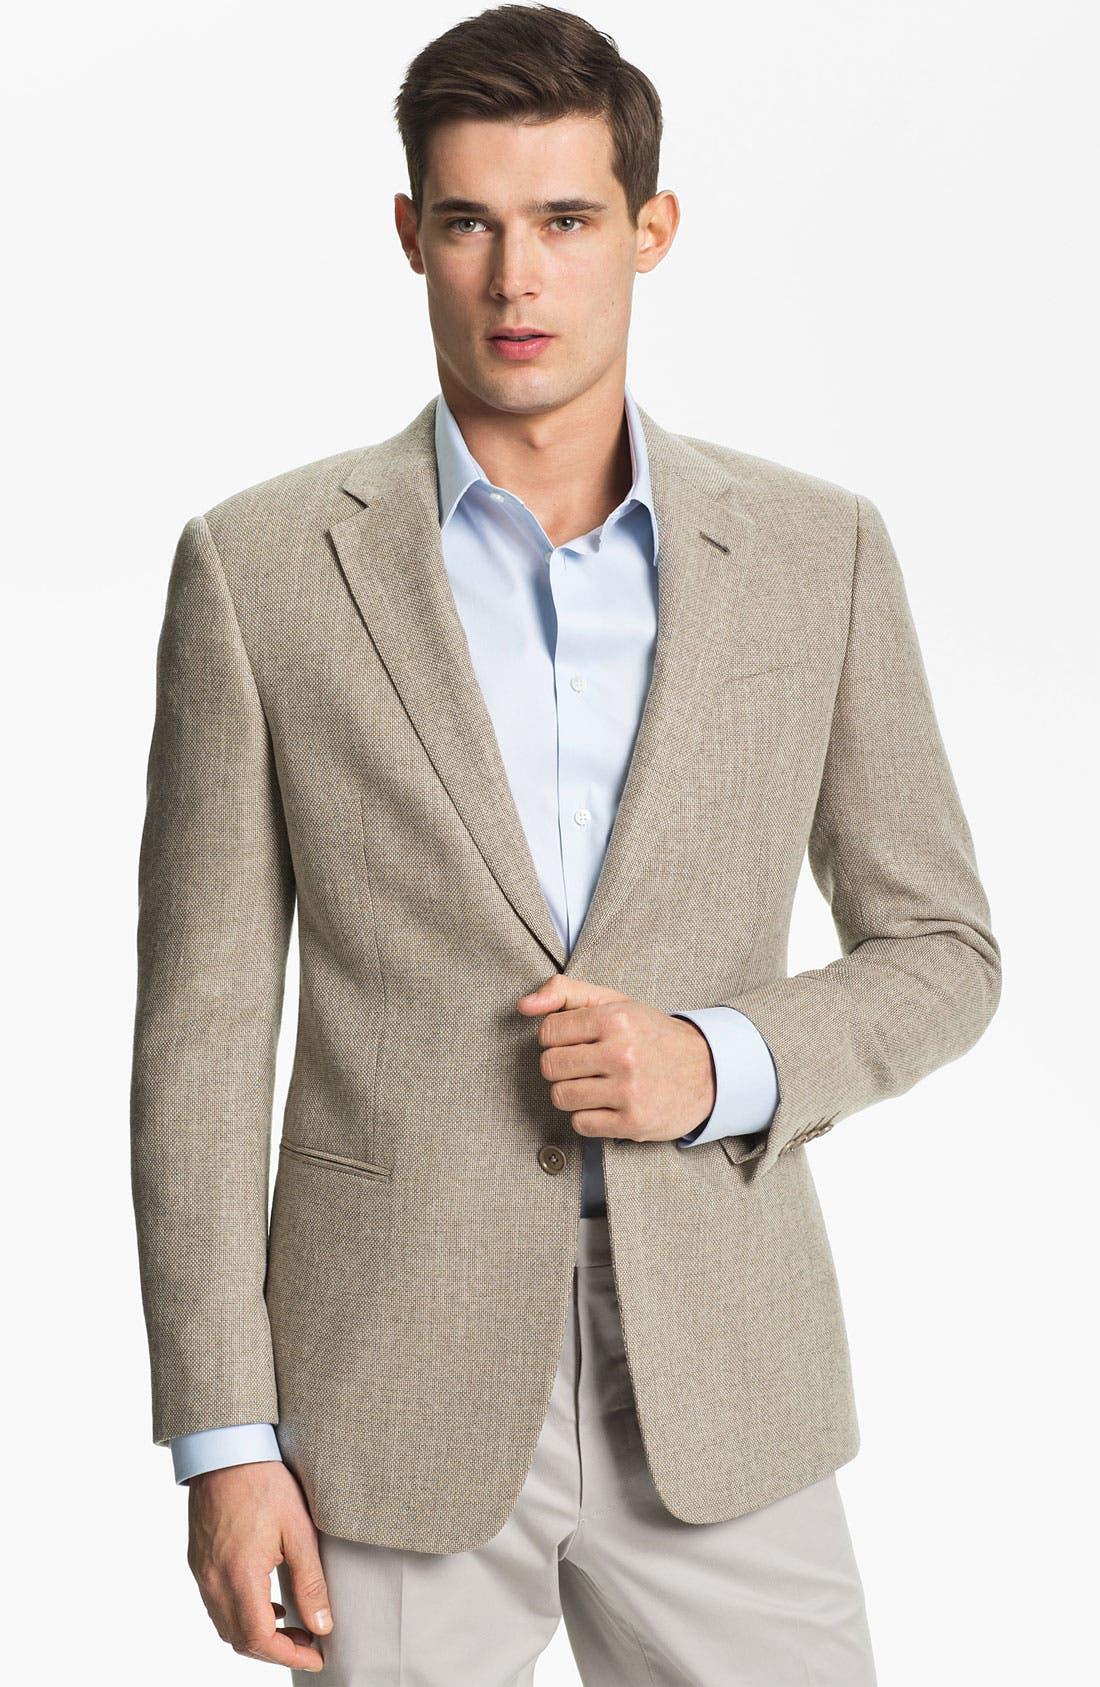 Alternate Image 1 Selected - Armani Collezioni 'Giorgio' Textured Wool Sportcoat